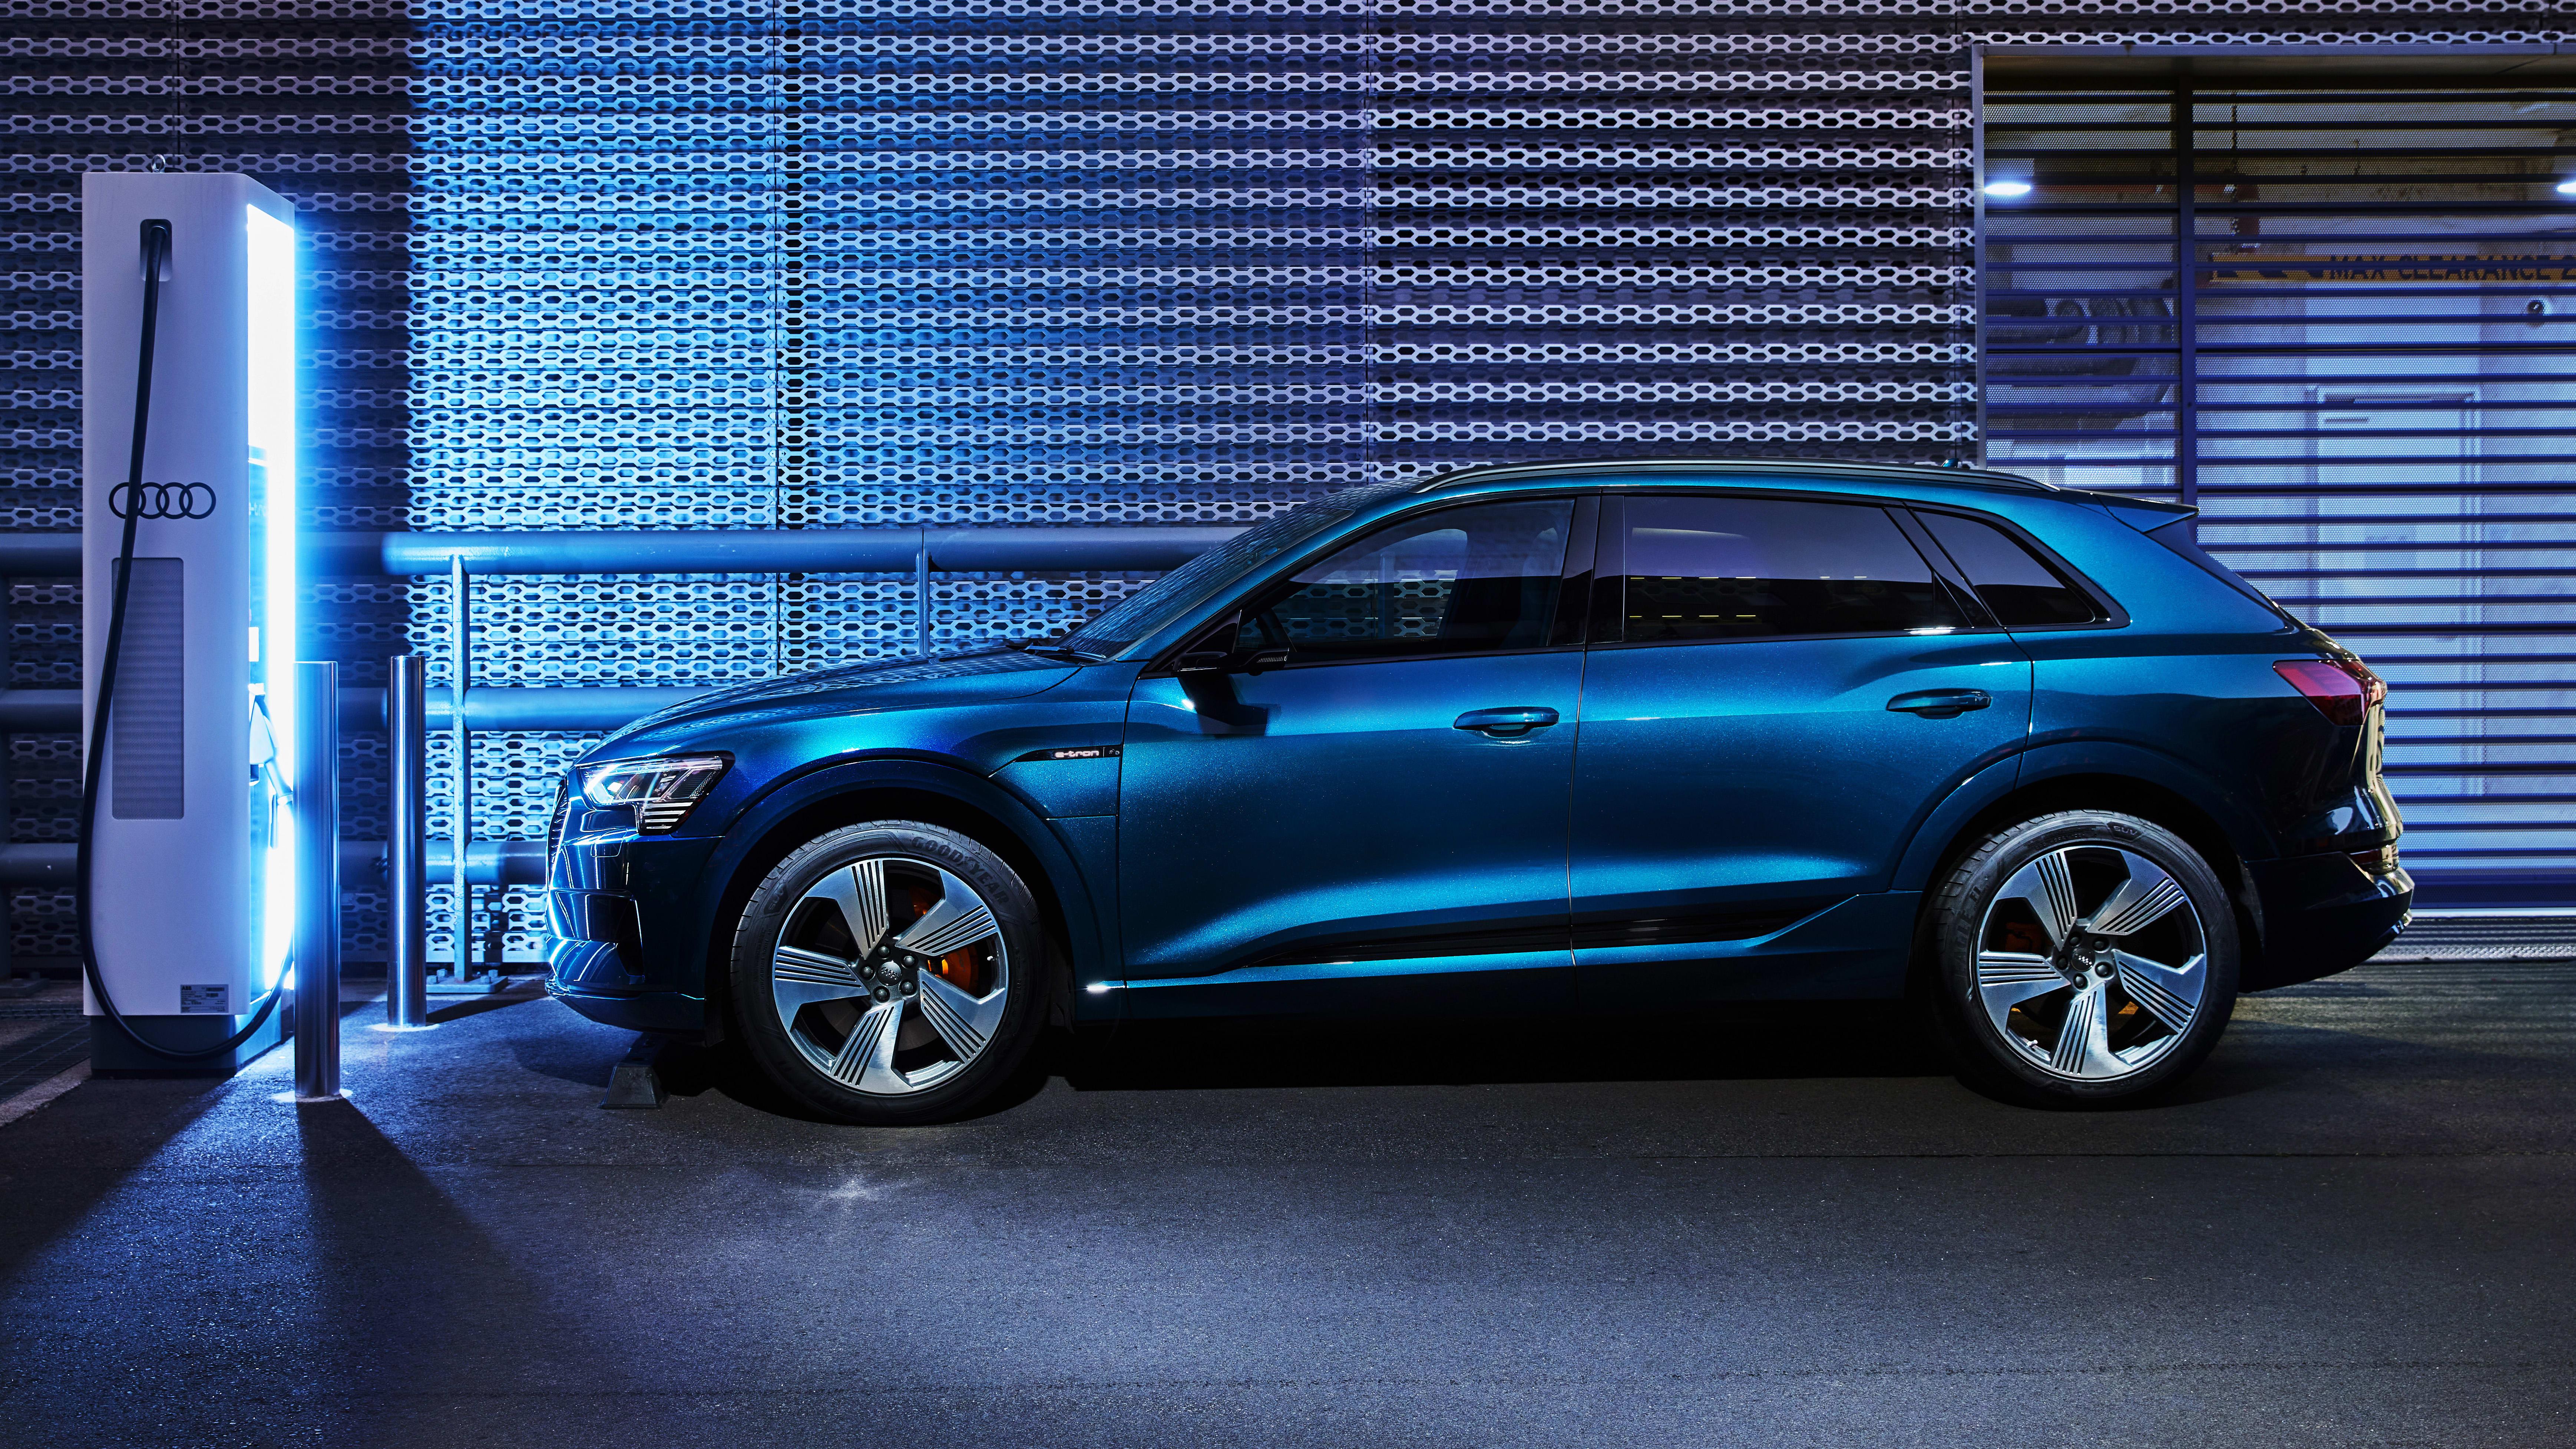 2020 Audi E Tron Suv And E Tron Sportback Price And Specs Update Caradvice